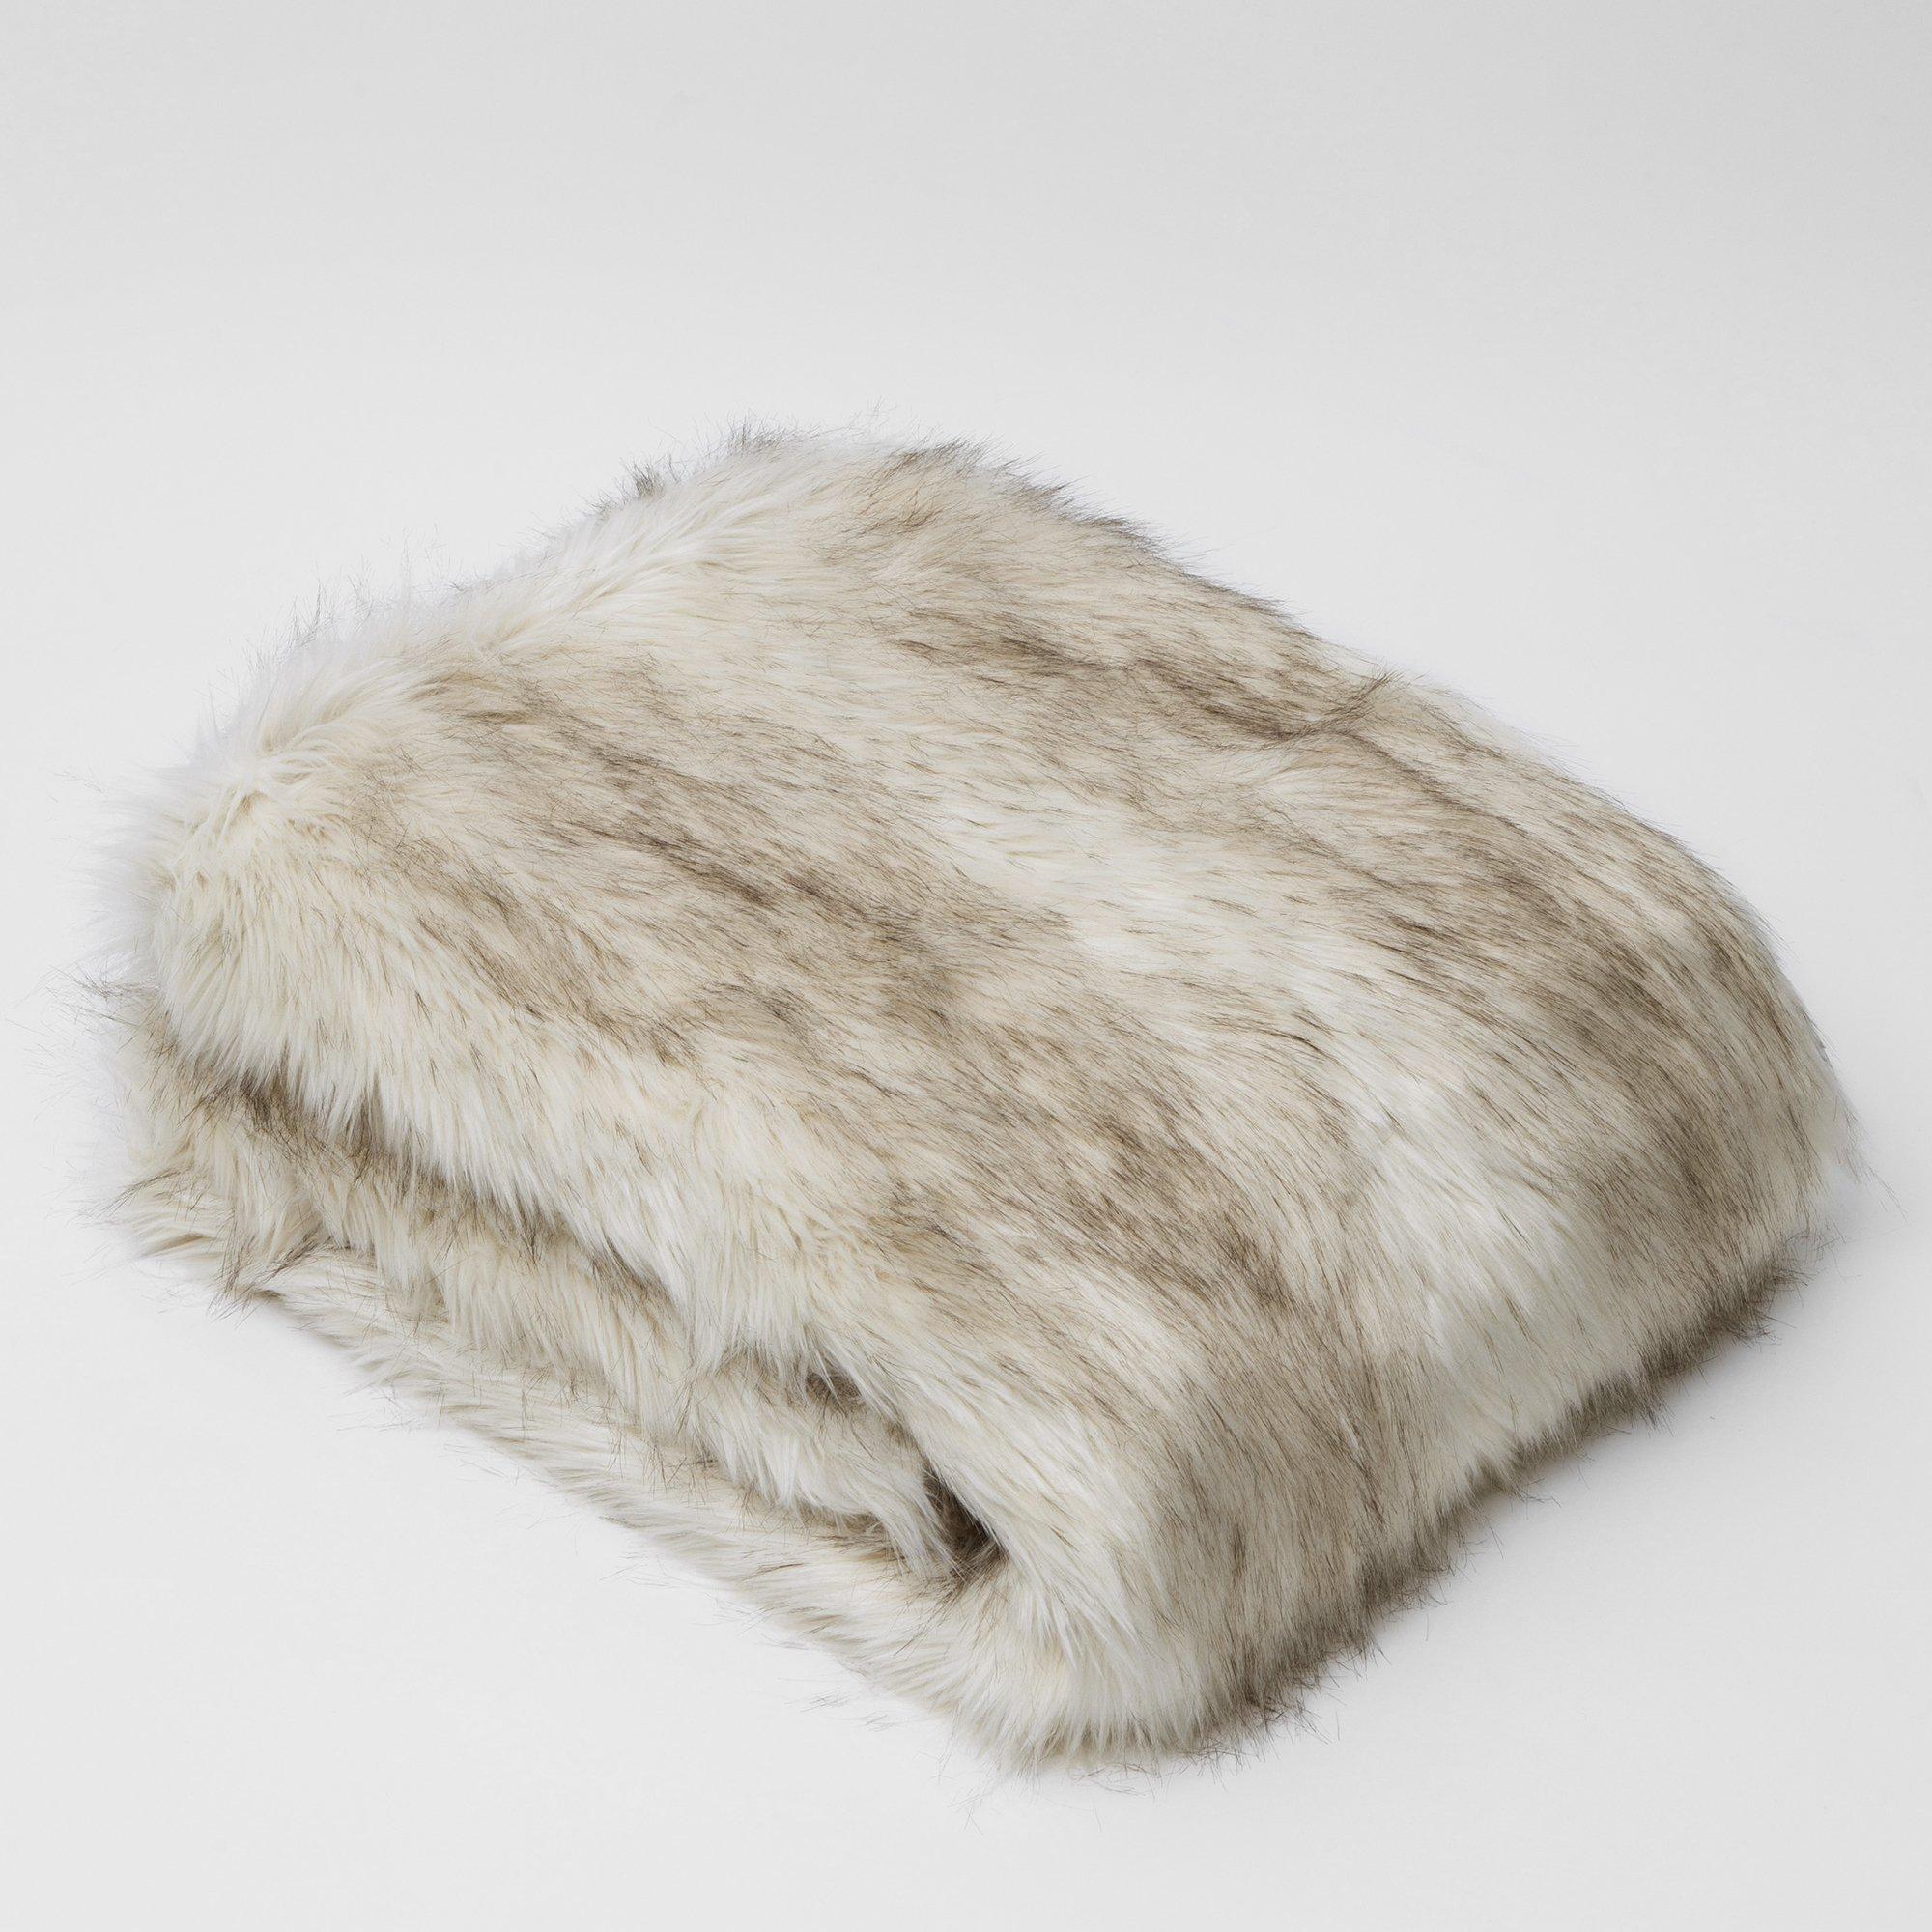 Best Home Fashion Faux Fur Throw - Full Blanket - Champagne Fox - 58''W x 84''L - (1 Throw)